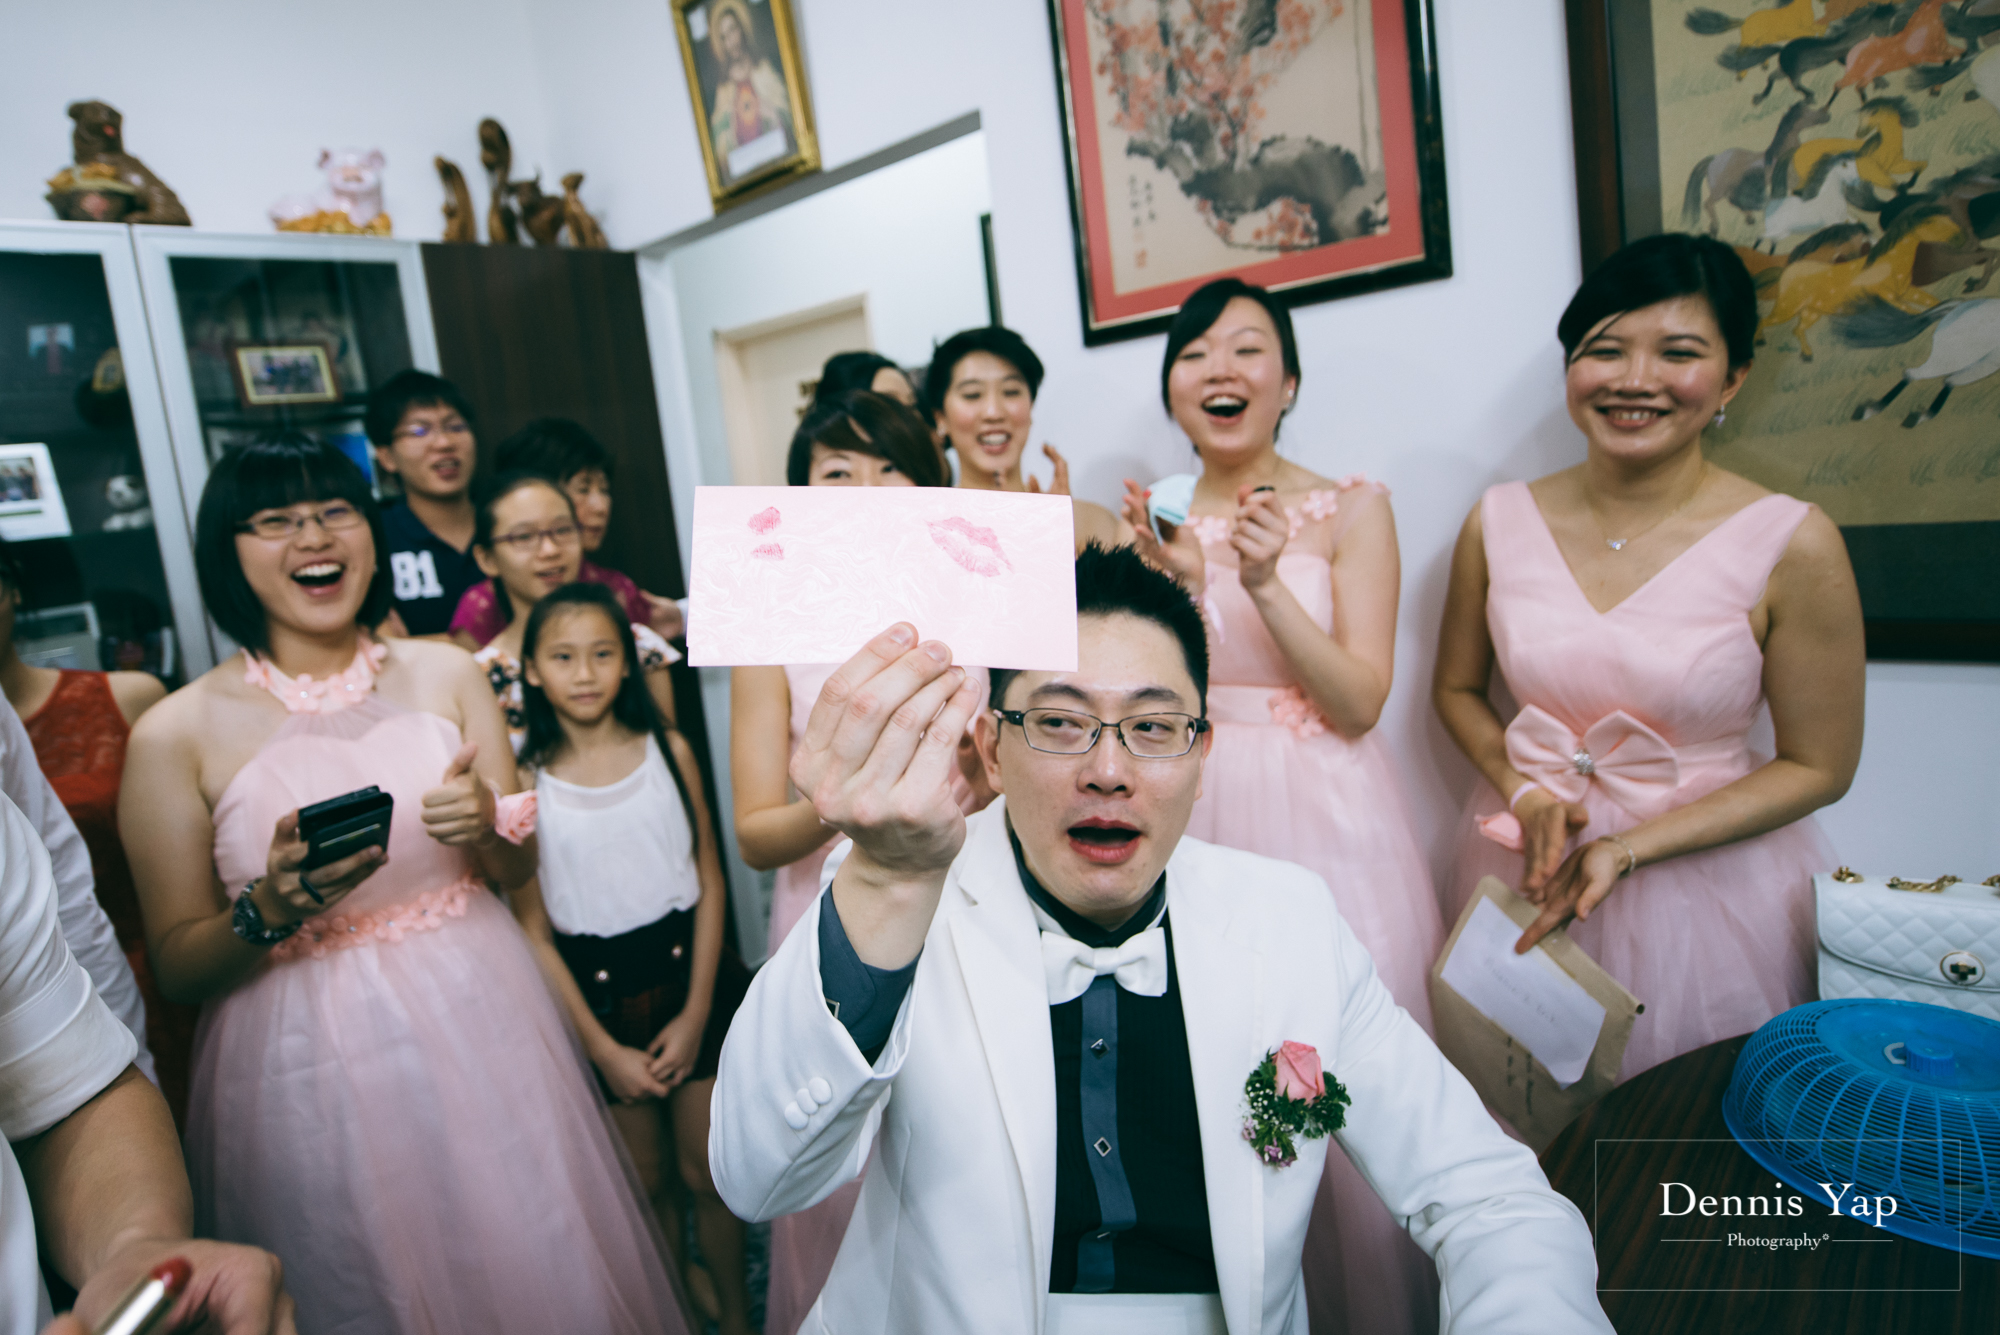 alex shir ley wedding day gate crash subang jaya usj dennis yap photography moments-10.jpg